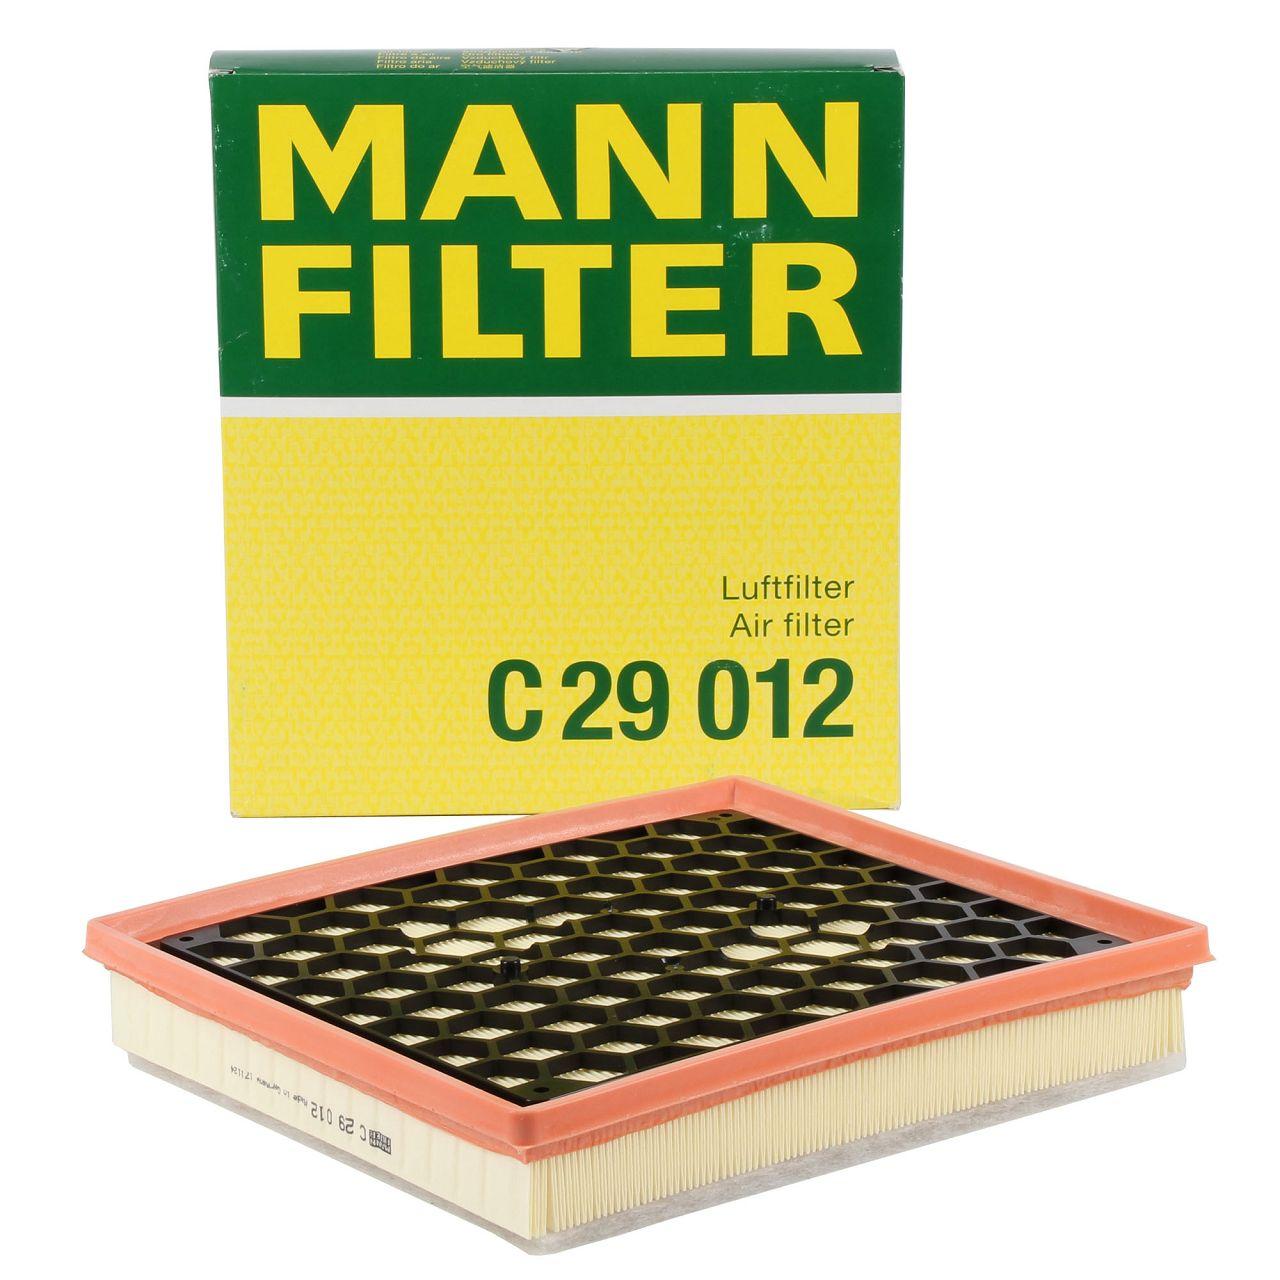 MANN C29012 Luftfilter Motorluftfilter für OPEL INSIGNIA A SAAB 9-5 (YS3G)